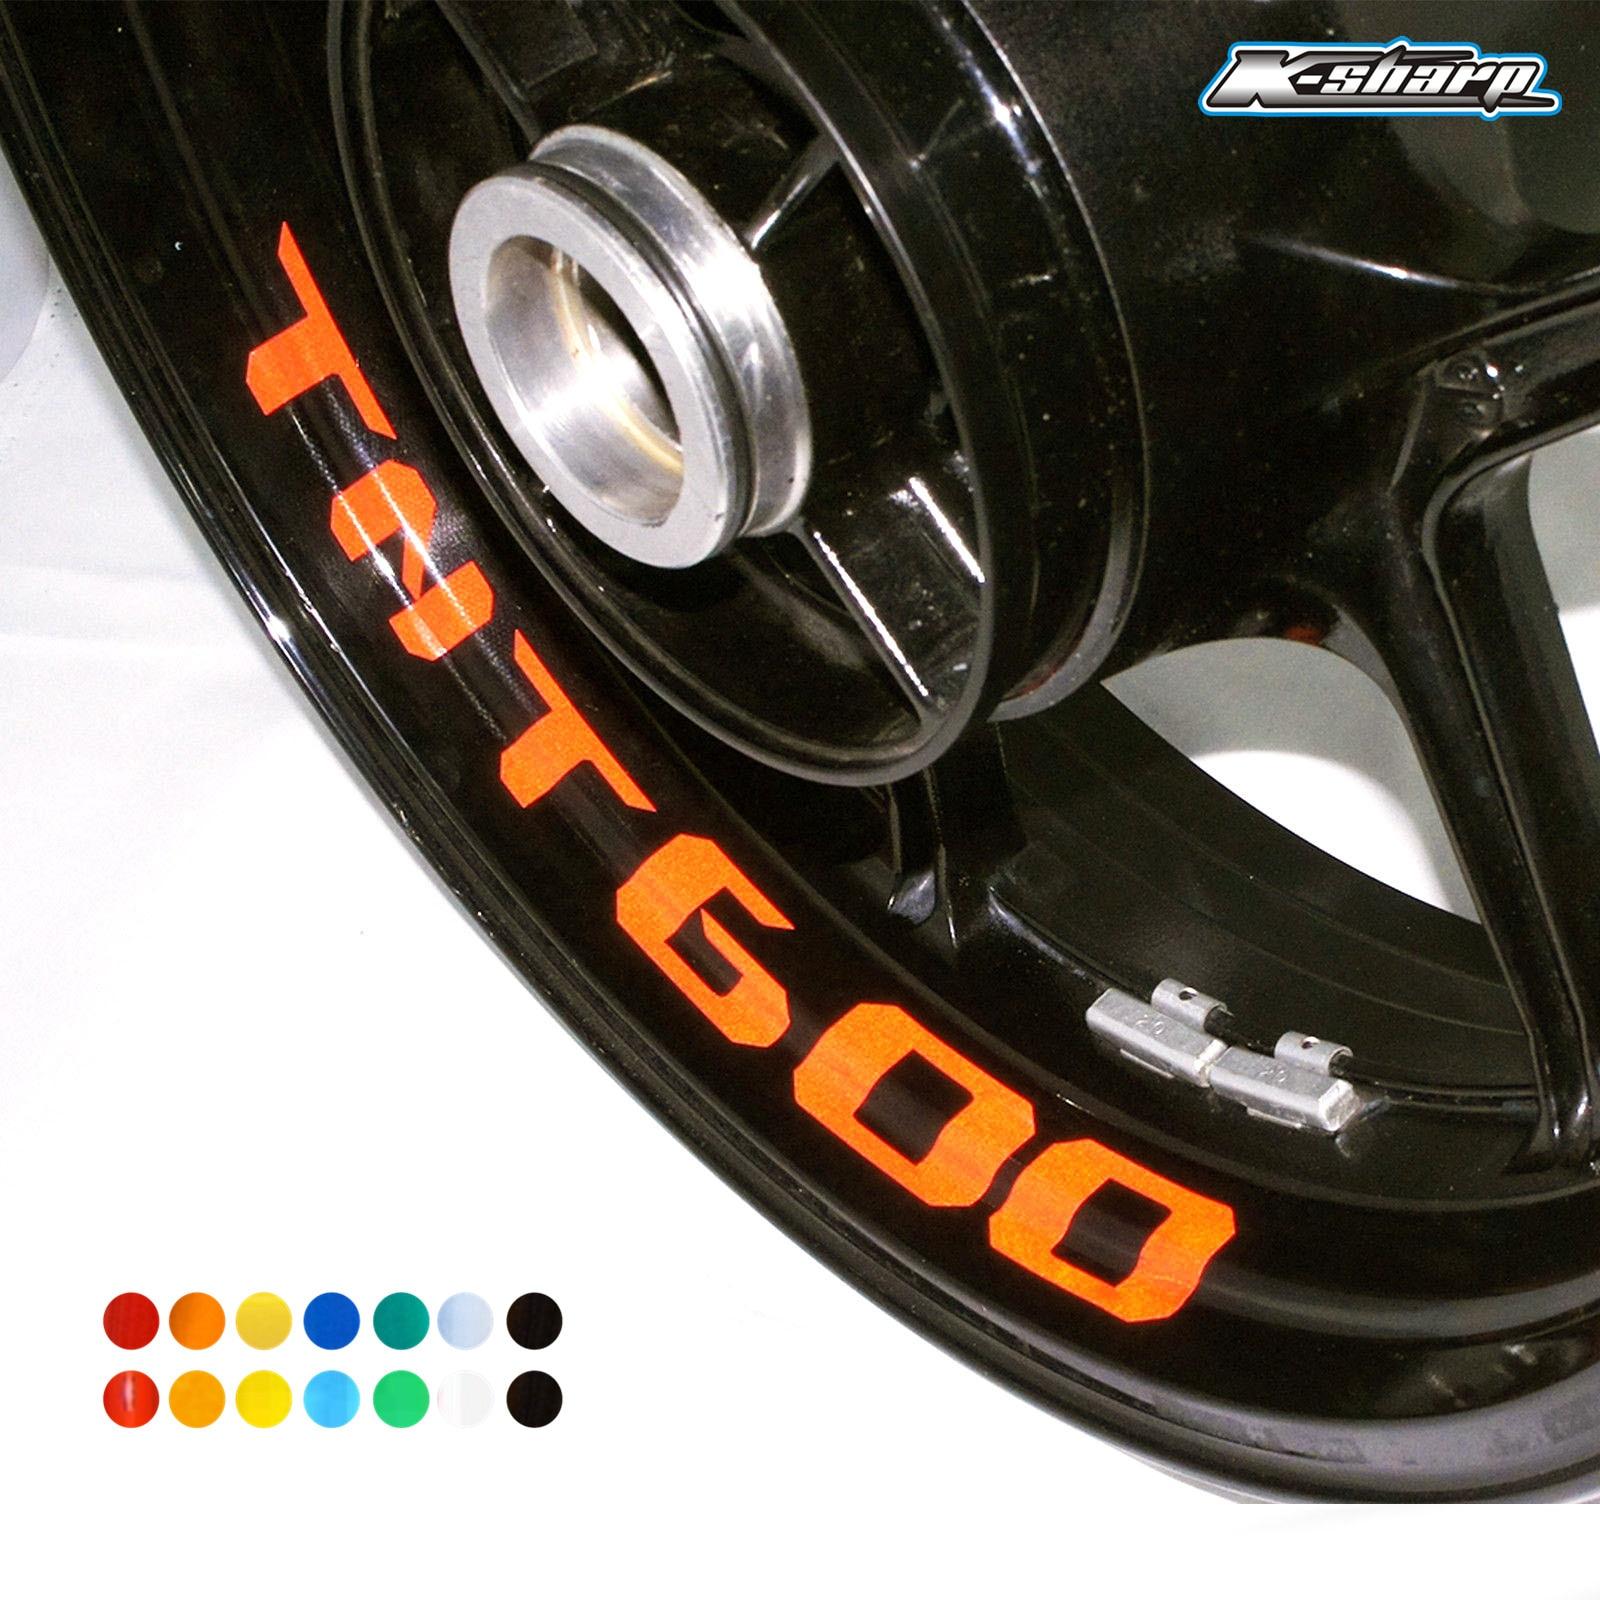 8 X custon interior decalques aro da roda reflexivo Adesivos sinal stripes FIT BENELLI TNT 600 TNT600